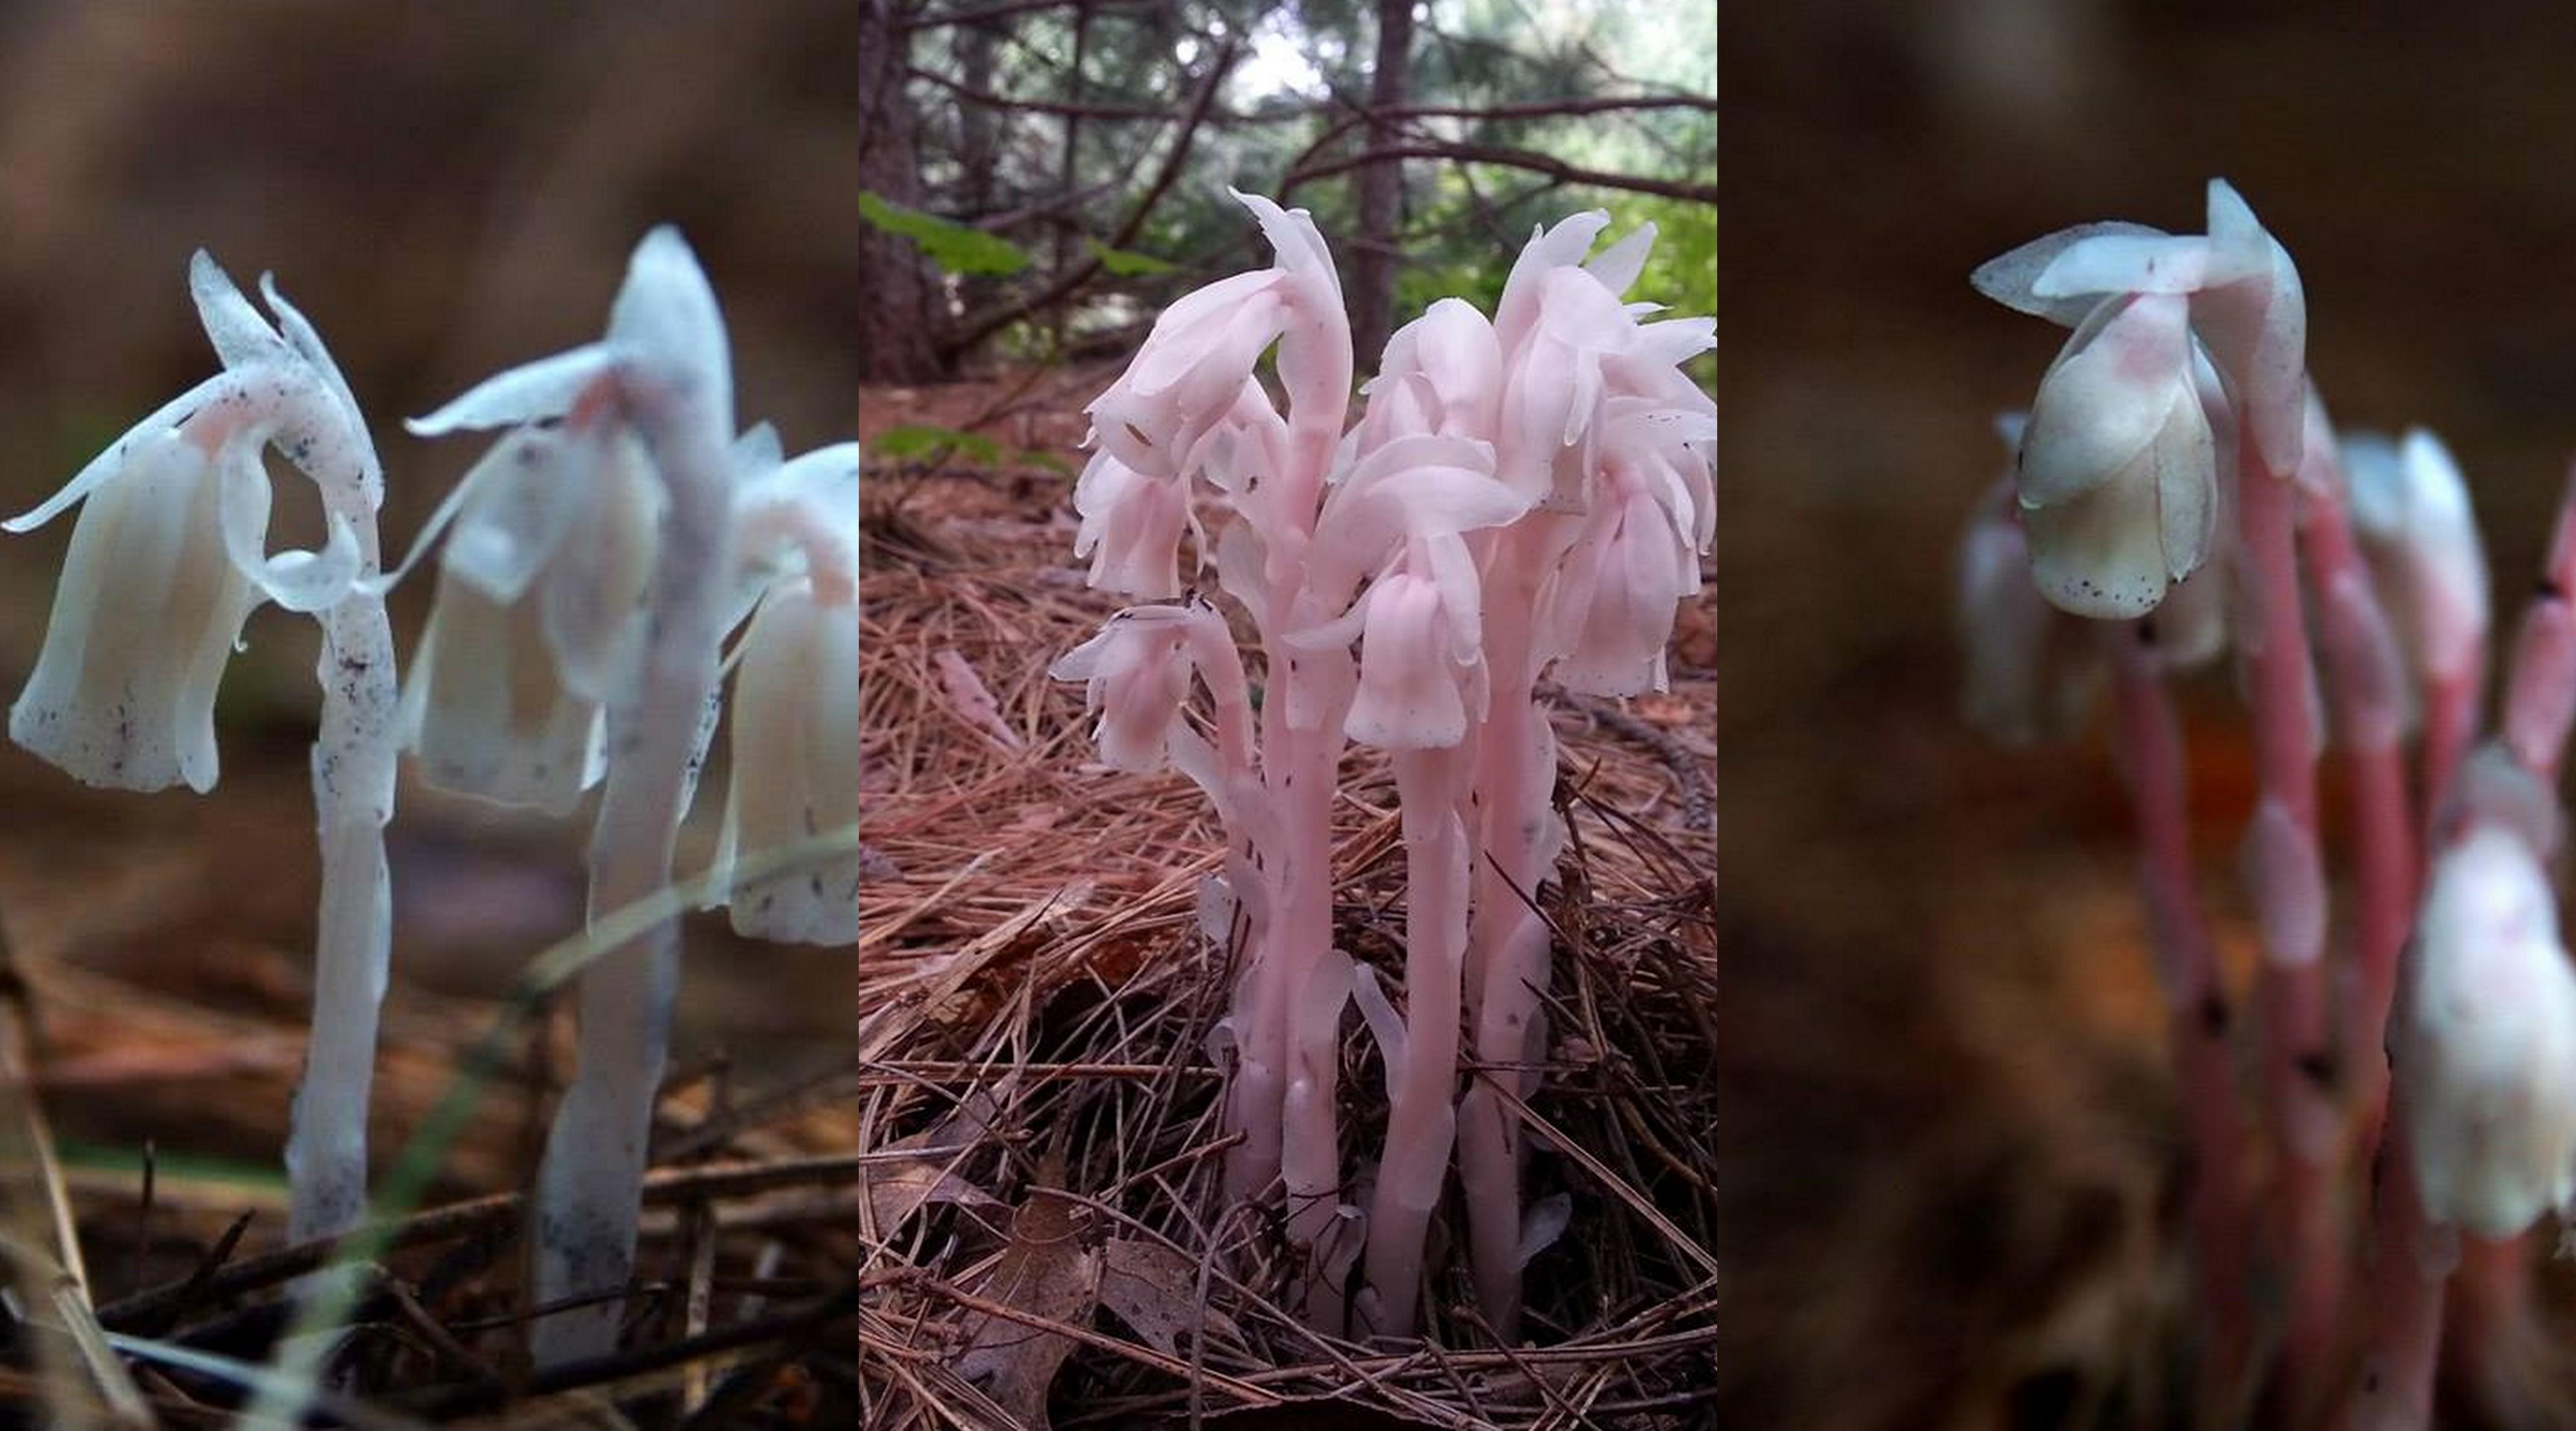 Color range of ghost plant. Fun fact: these photos were taken less than 10 minutes and 30 feet apart. Photo: Katie Grzesiak